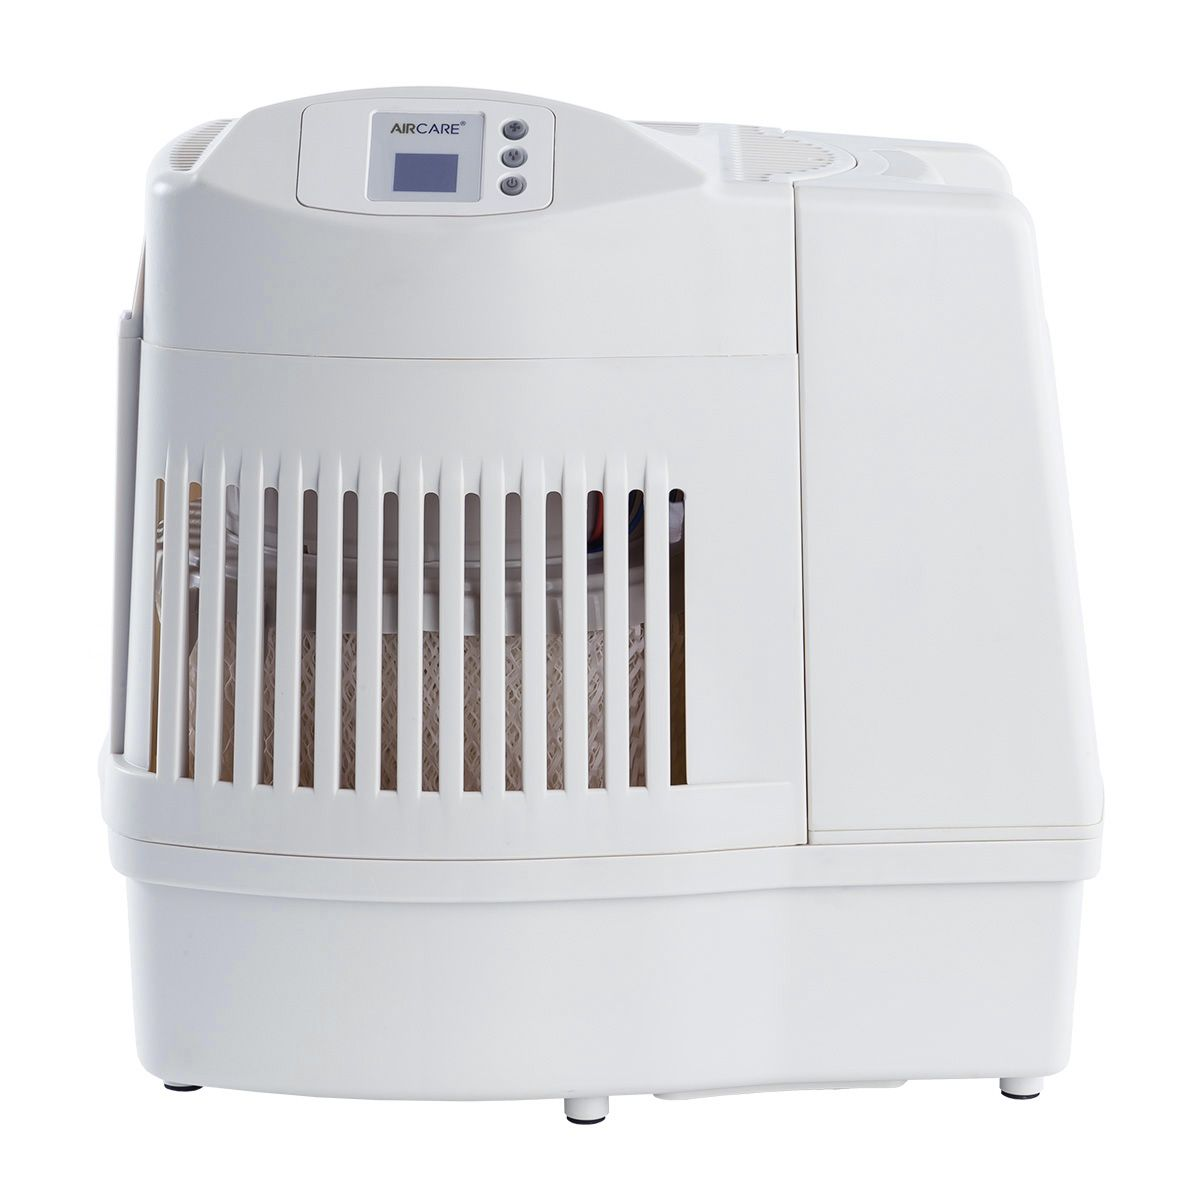 AIRCARE MA0800 Mini Console Humidifier for 2600 sq. ft. - White